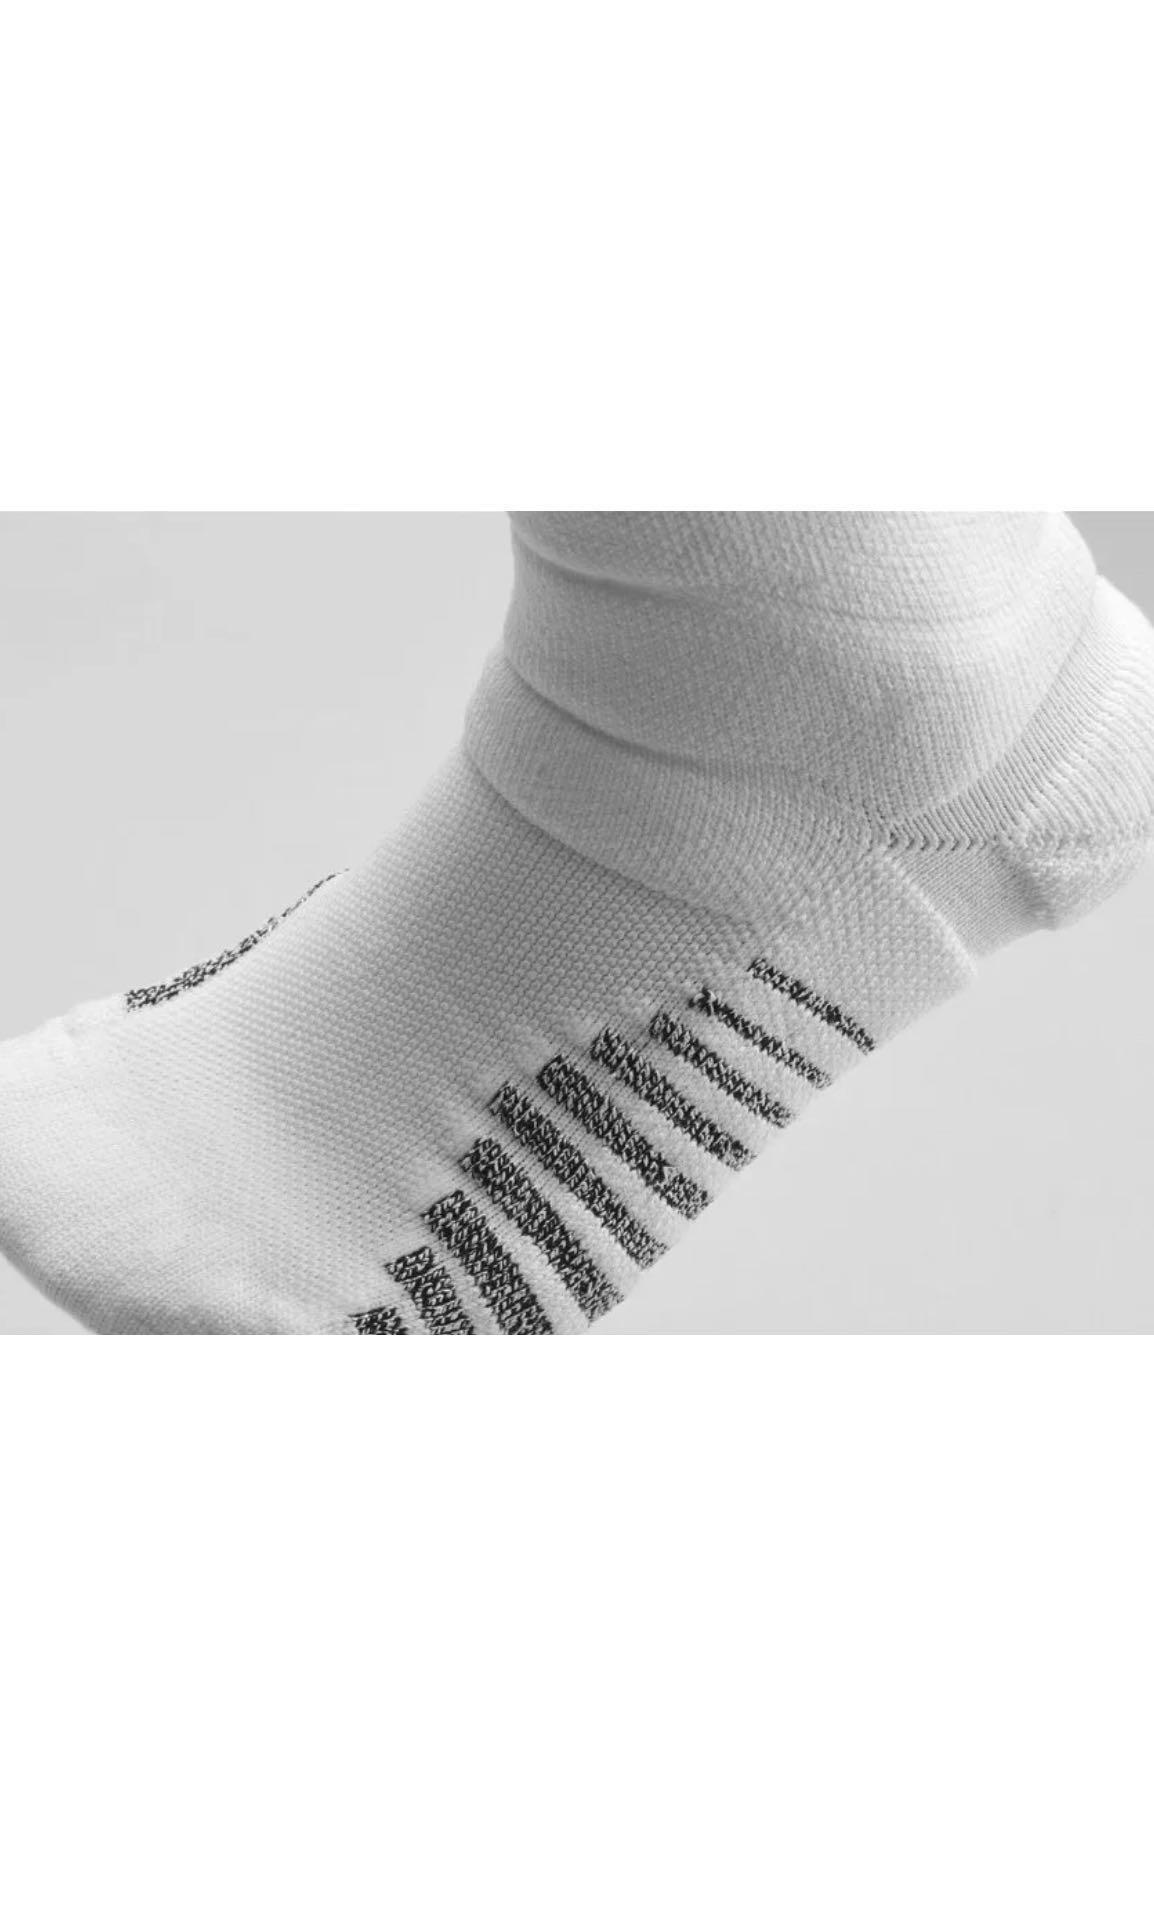 NikeGrip Crew Socks